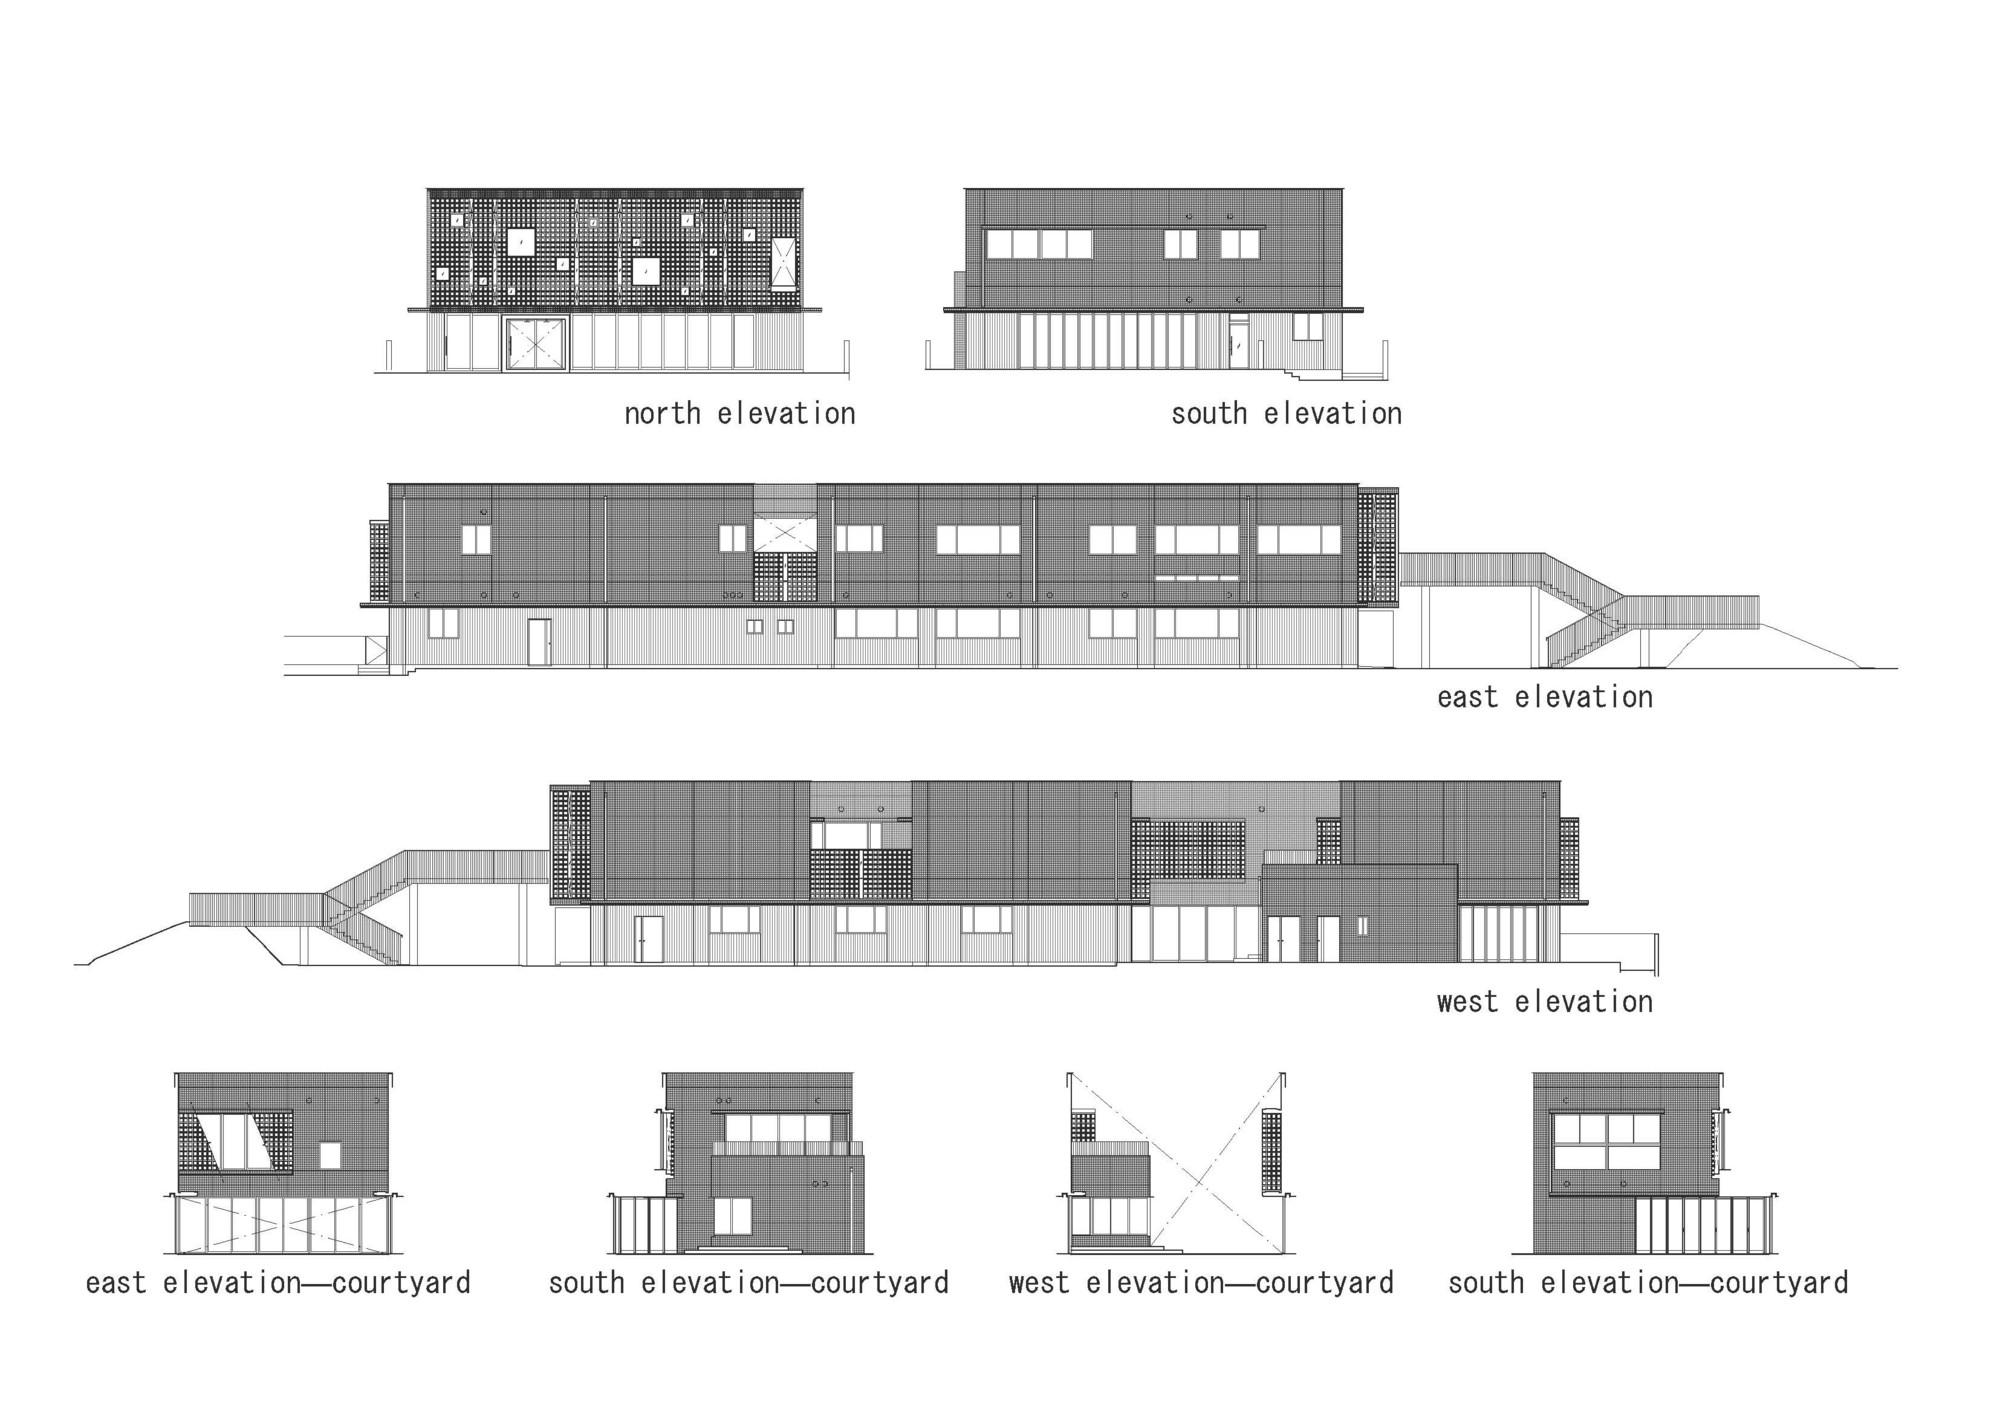 Elevation And Plan : Gallery of hanazono kindergarten and nursery